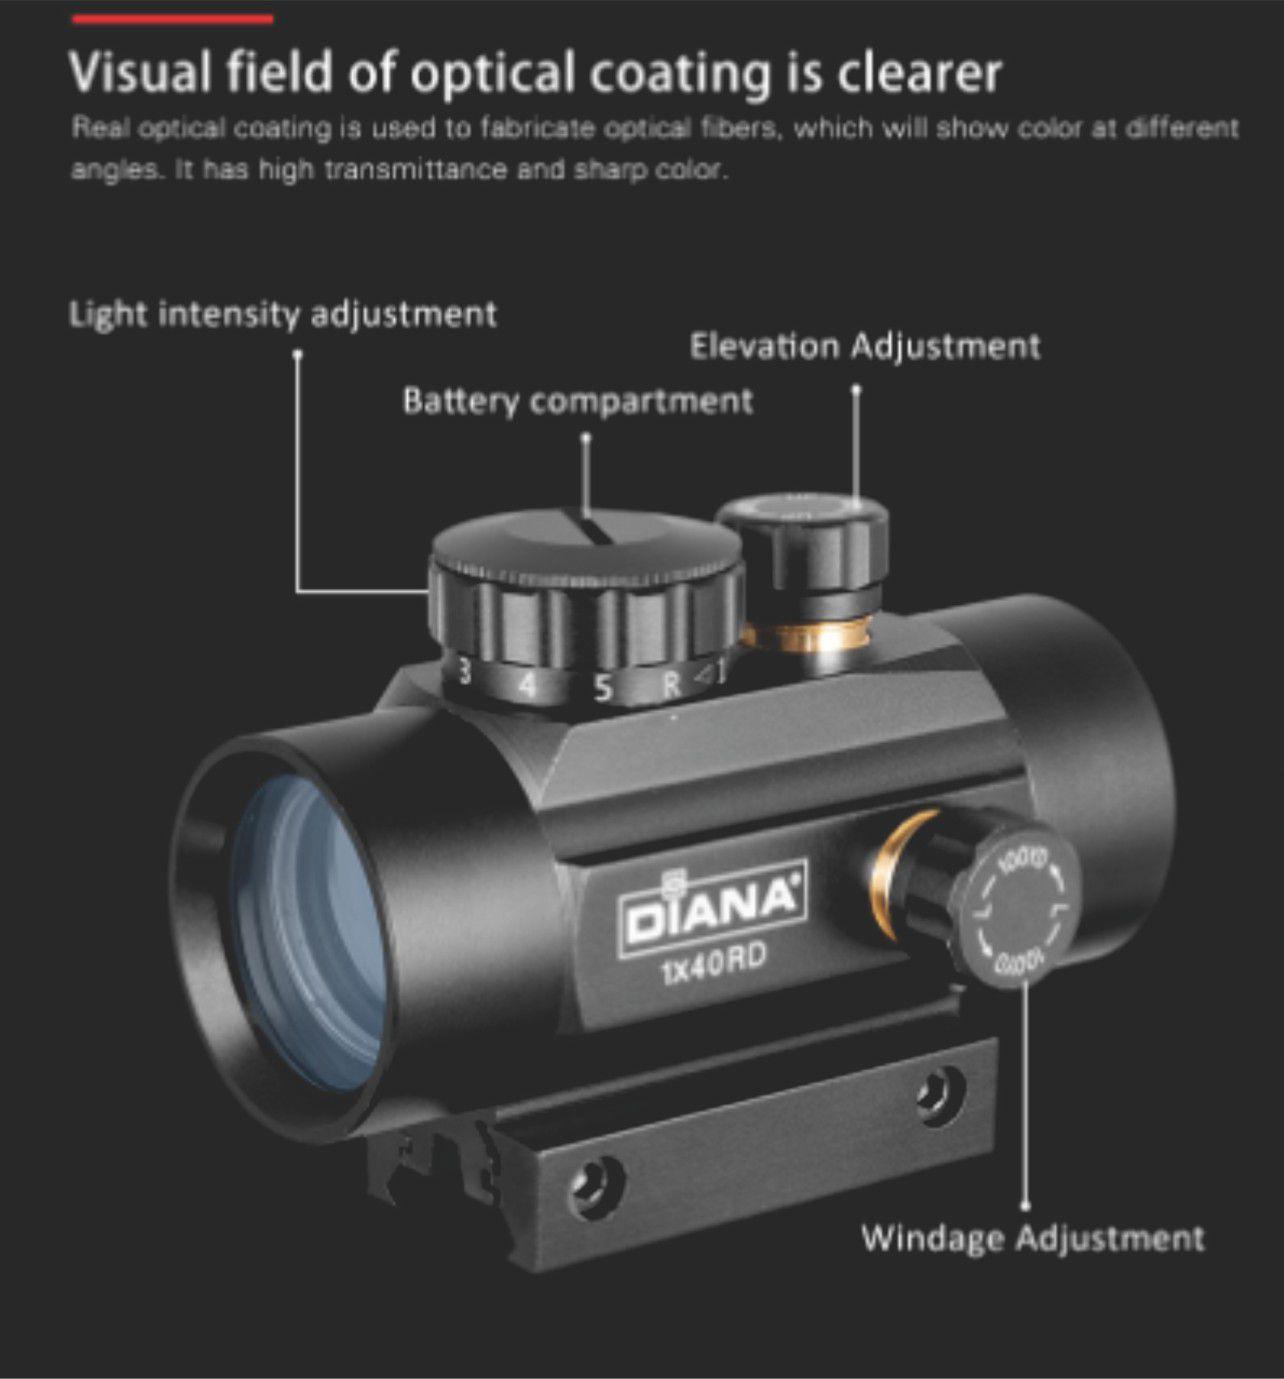 Reddot 3x44 com reticulo luminoso 10 niveis intensidade